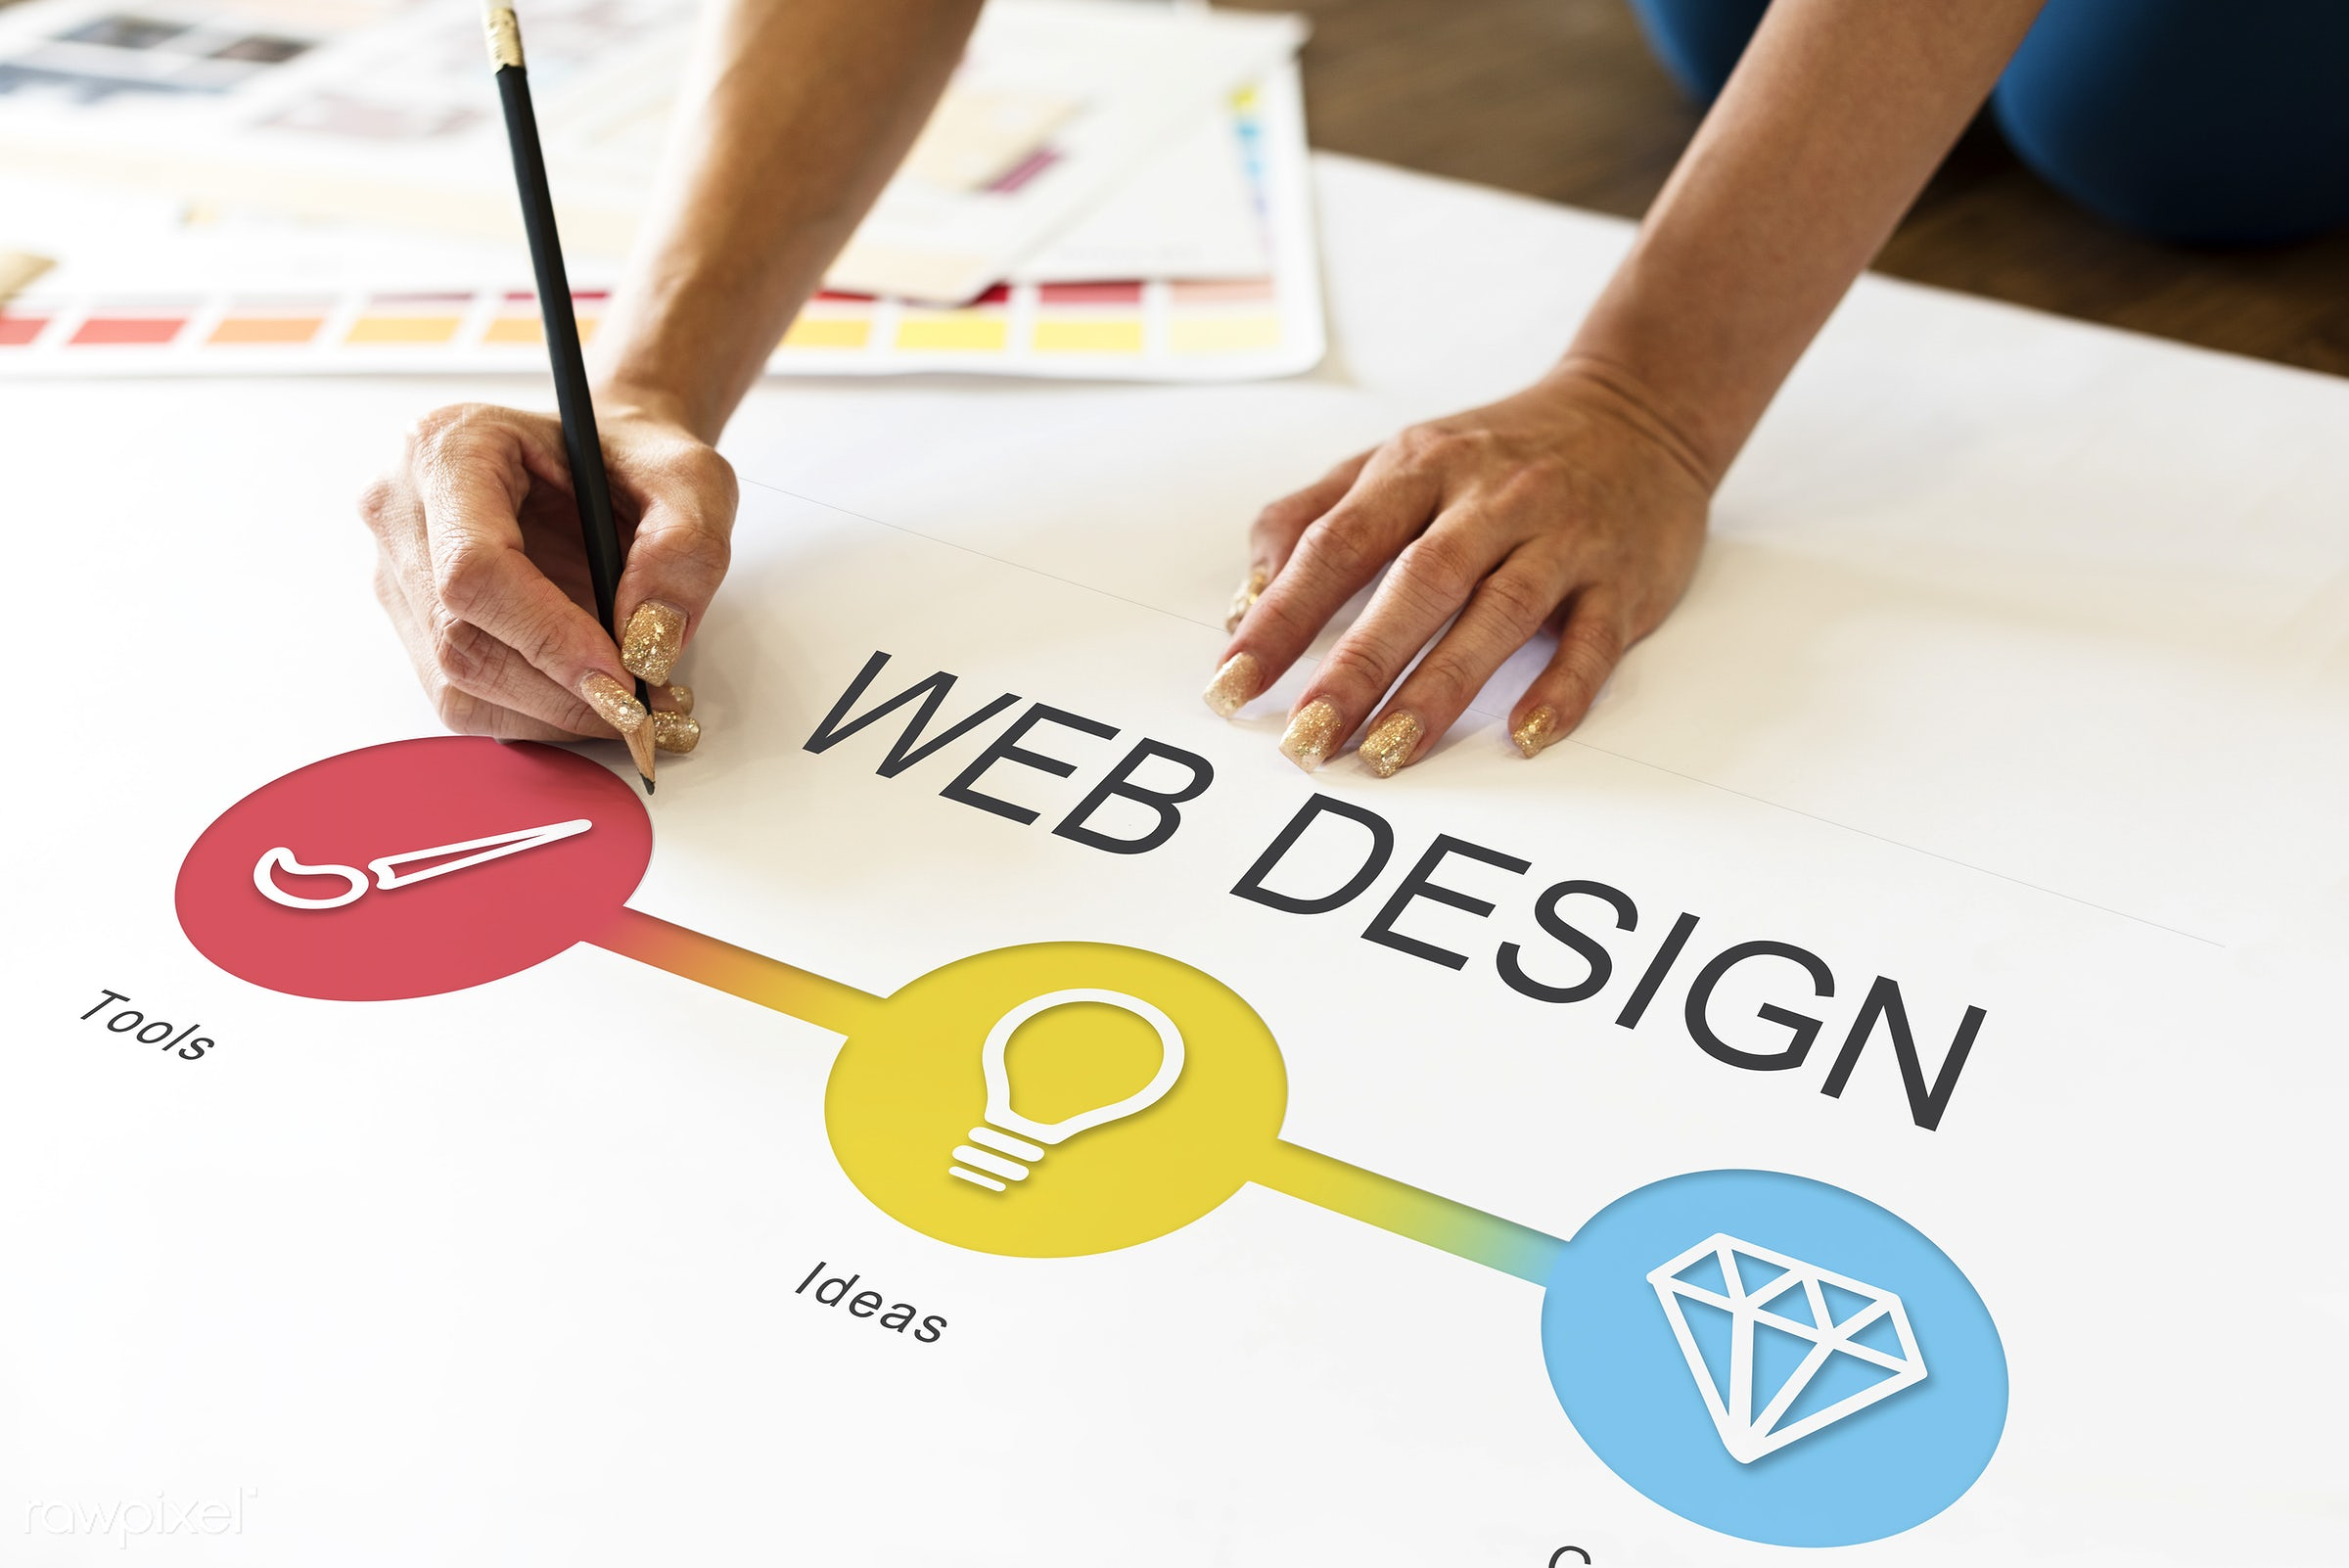 Web design - art, content, creation, creative, creativity, design, development, diagram, diamond, digital, drawing, graphic...